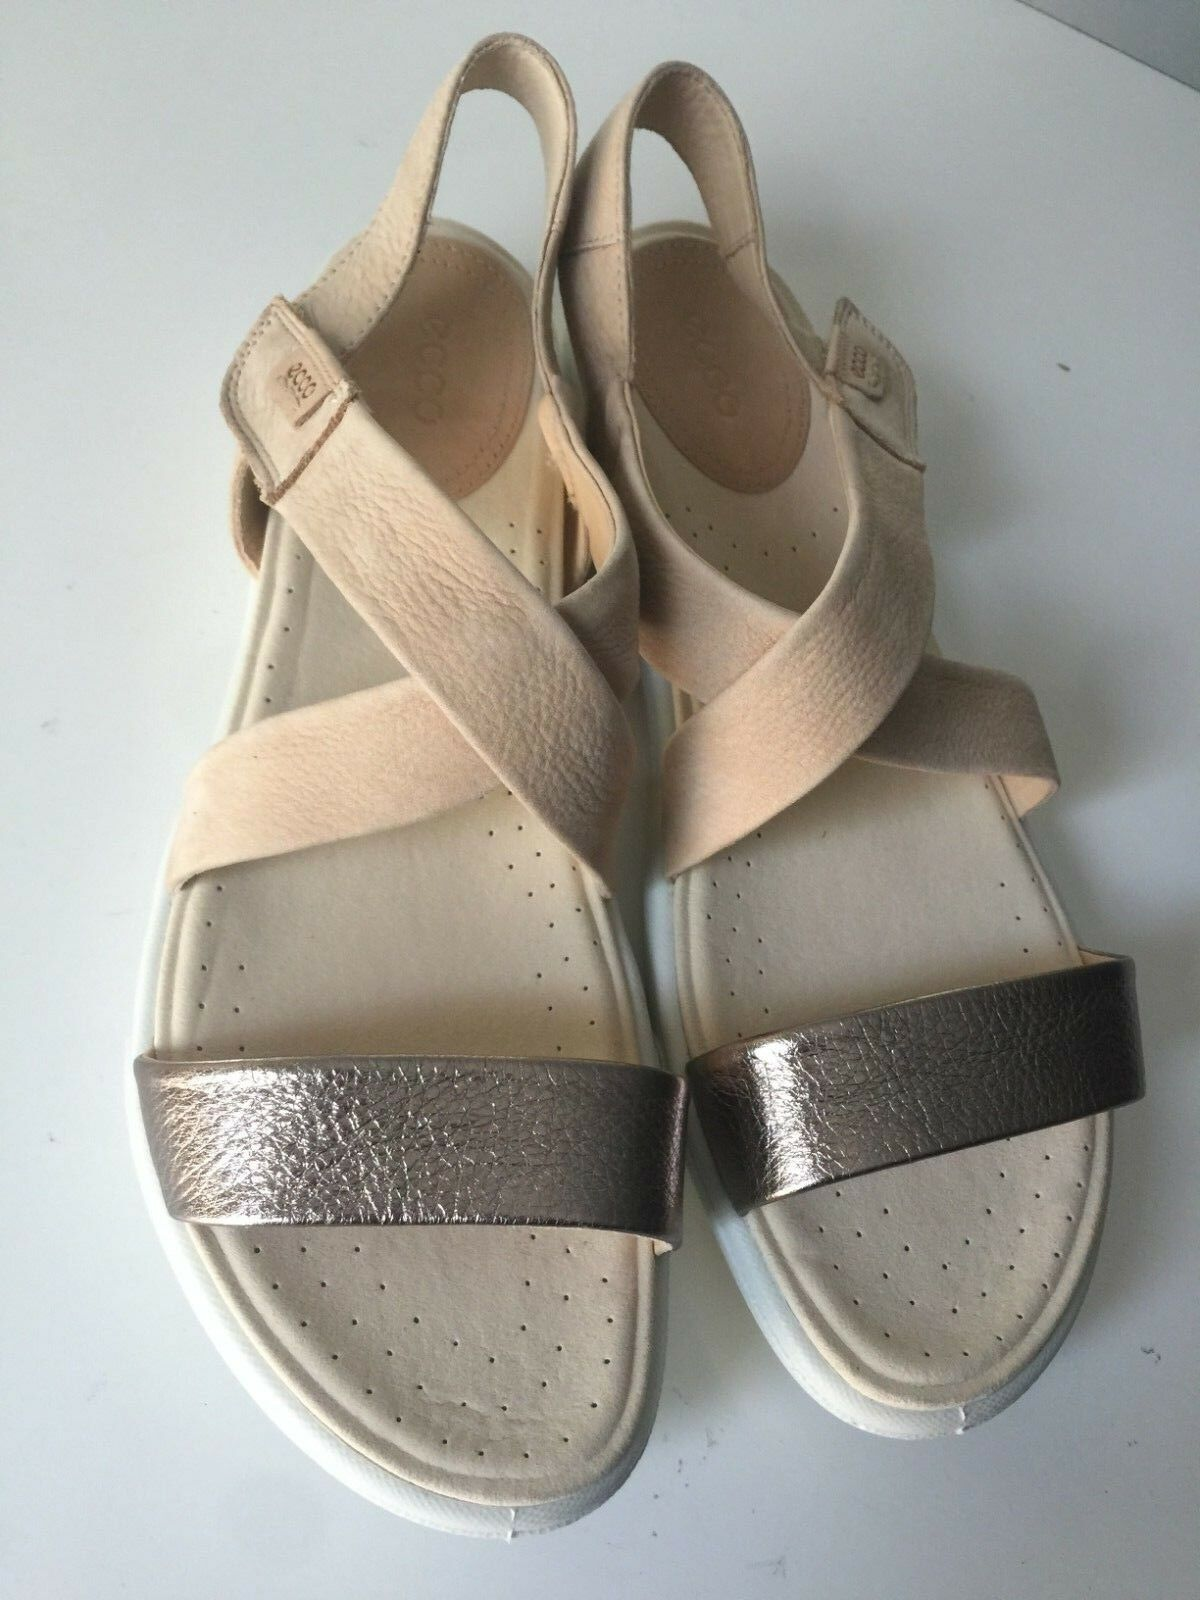 Ecco Damara Warm grå Powder Leather mycket-rem Tillfällig Öppen-toe sandaler 42 11